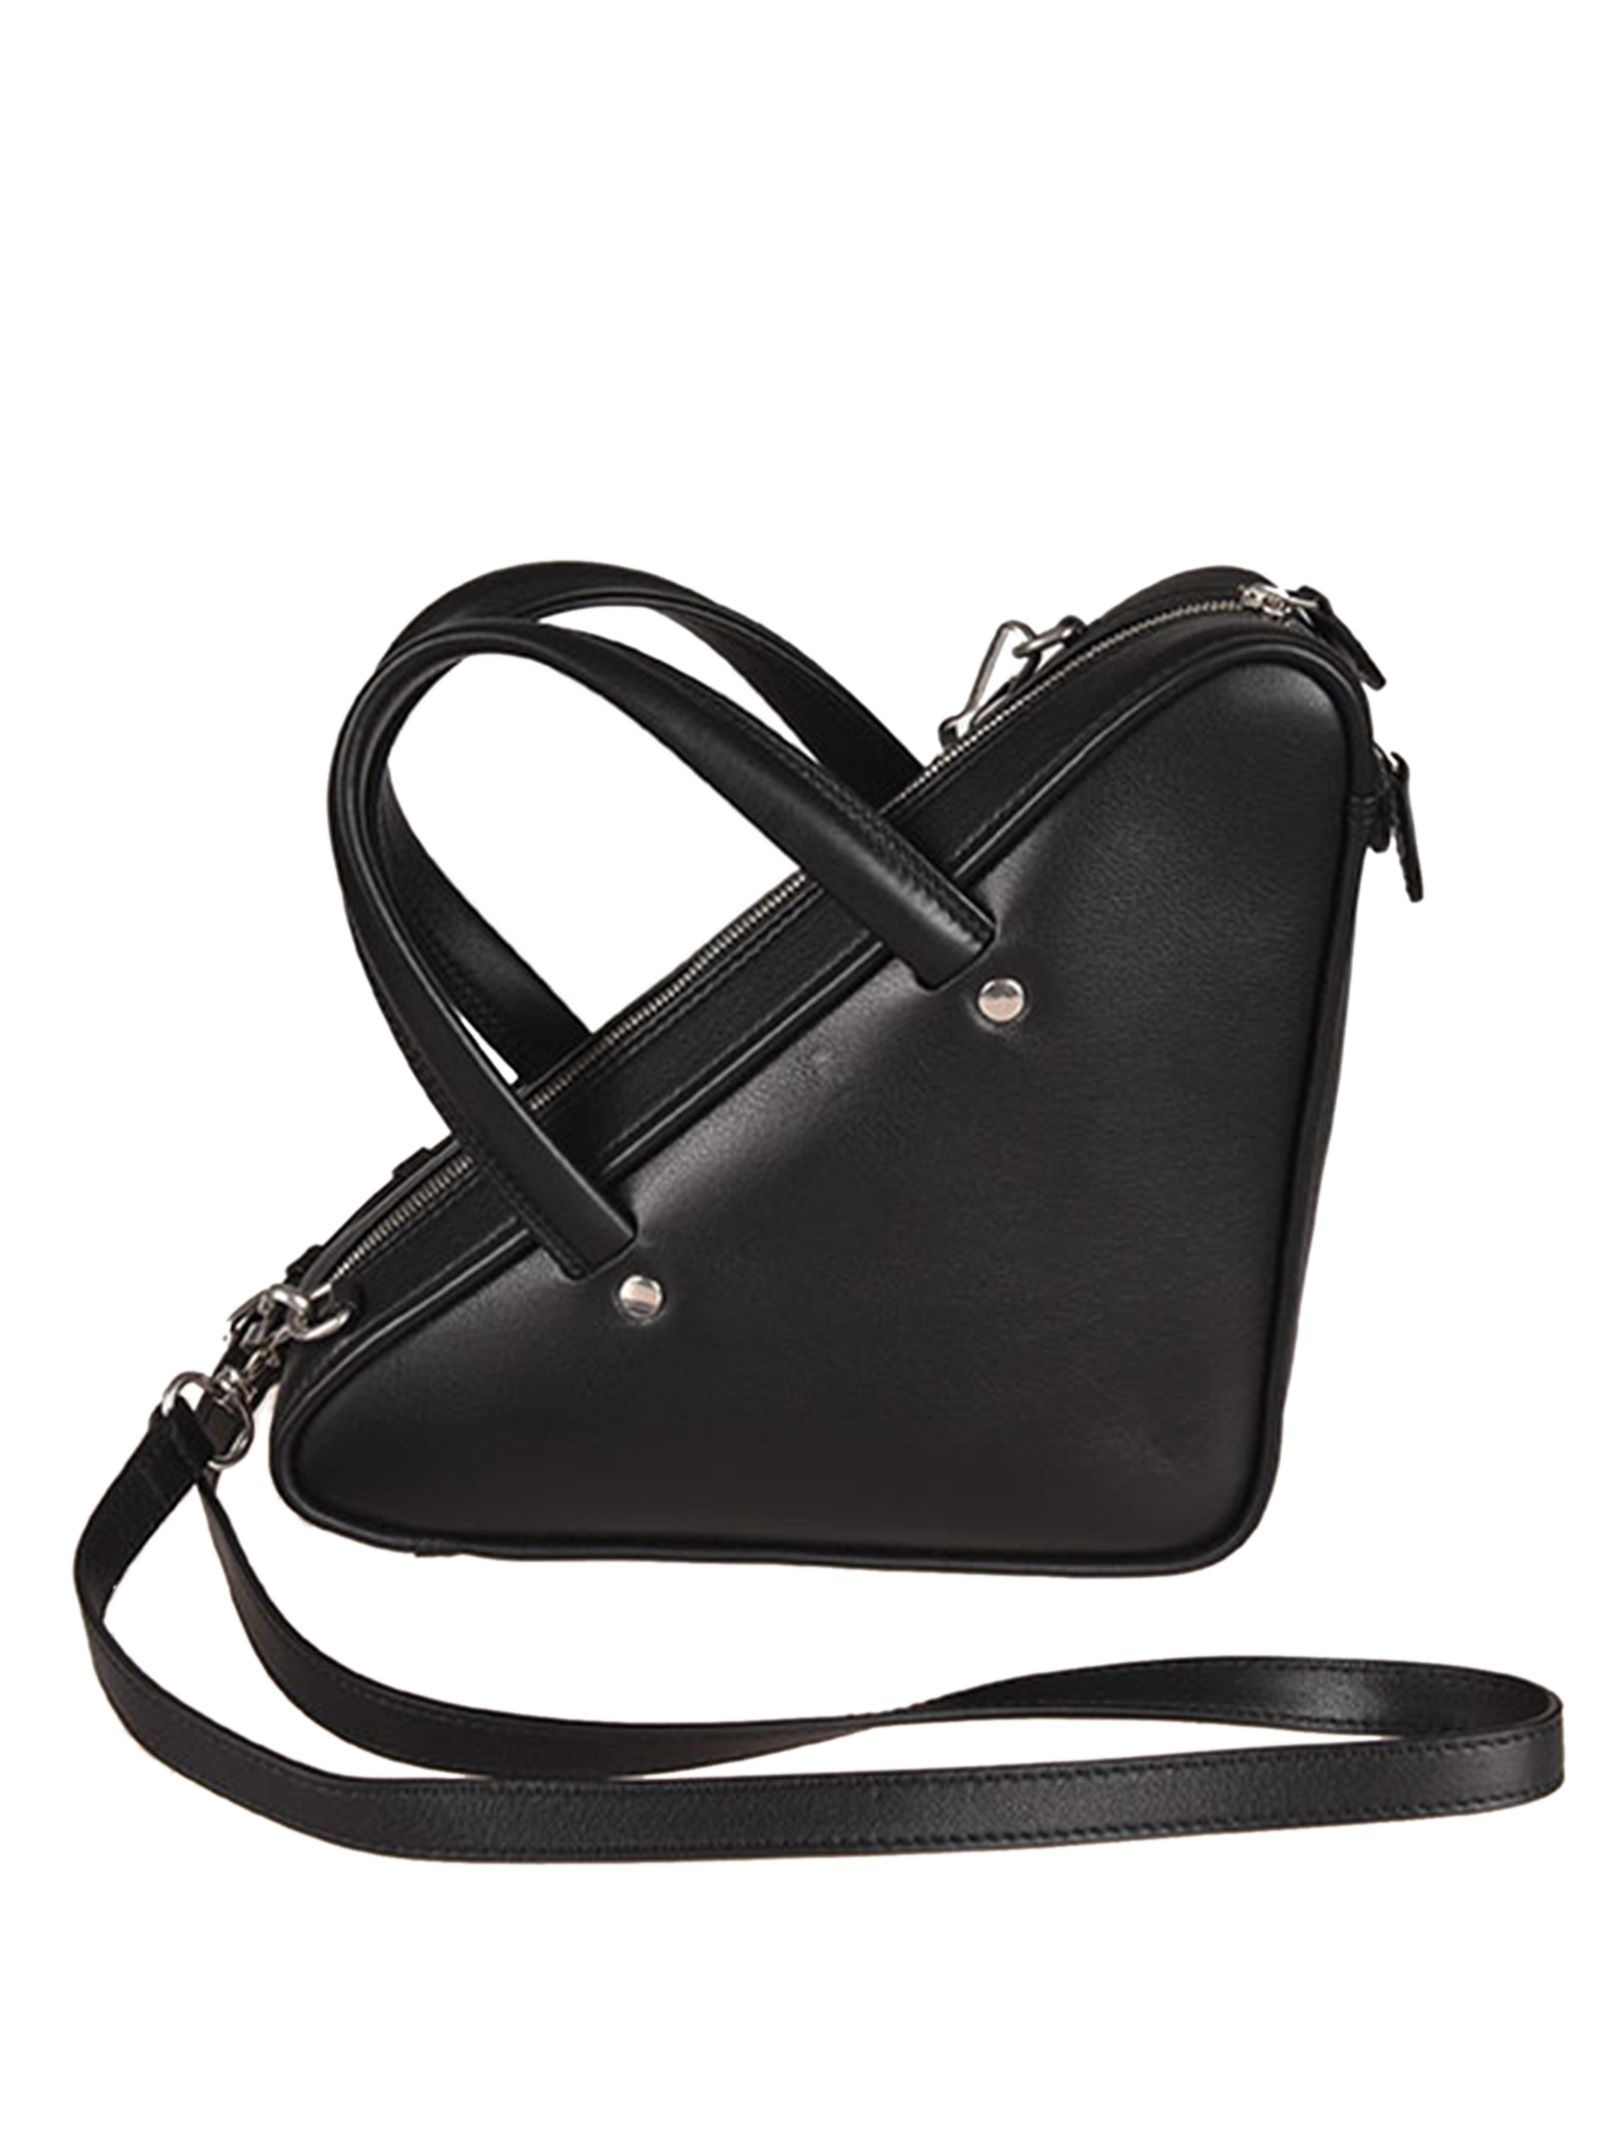 c14313382584 ... Balenciaga Xs Triangle Shoulder Bag - Noir blanc ...